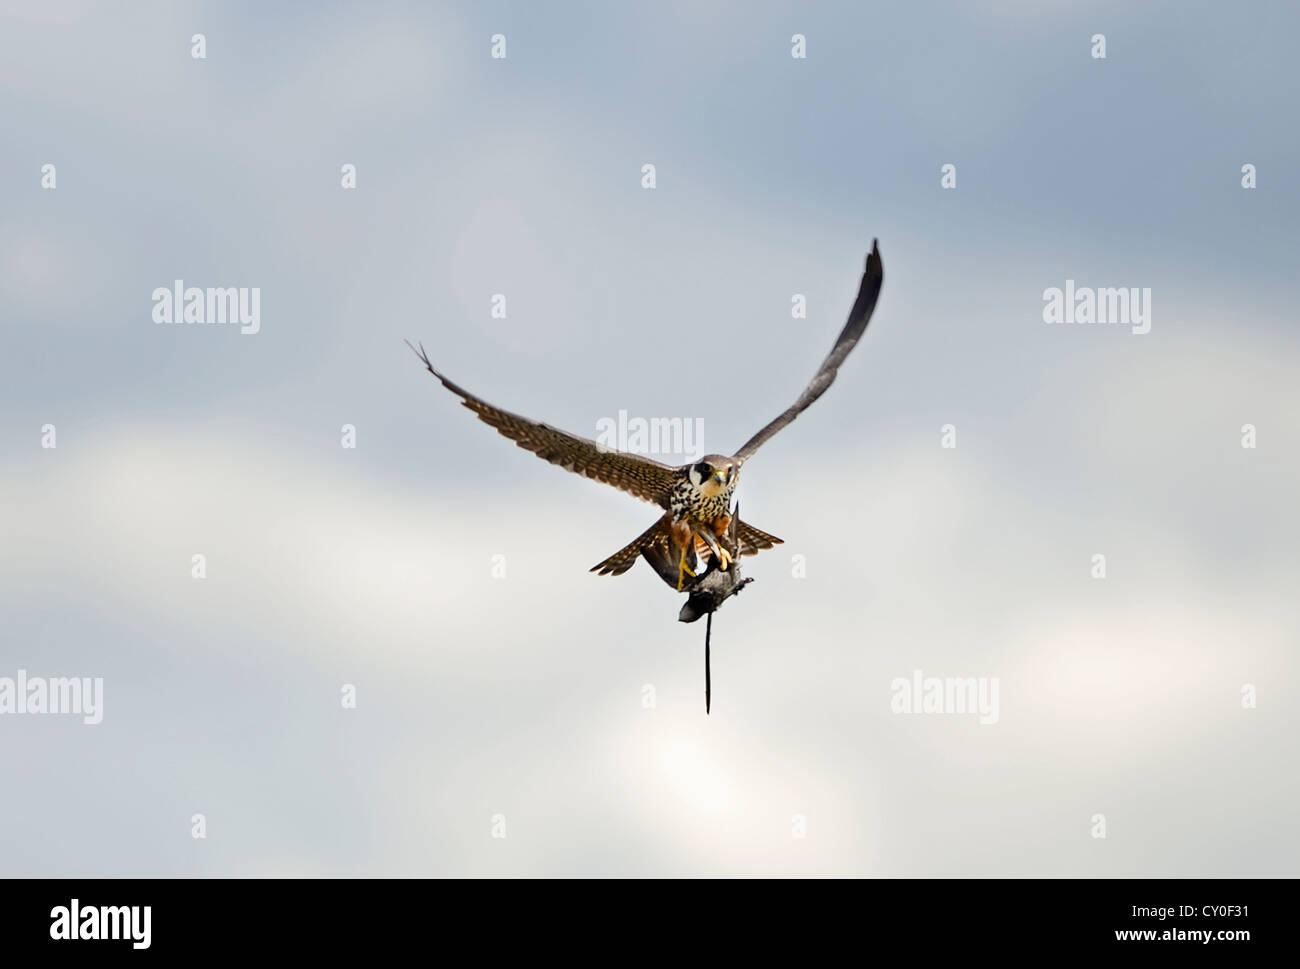 Hobby Falco Subbuteo con Swift Apus apus capturadas durante reedbed Norfolk Mayo Imagen De Stock